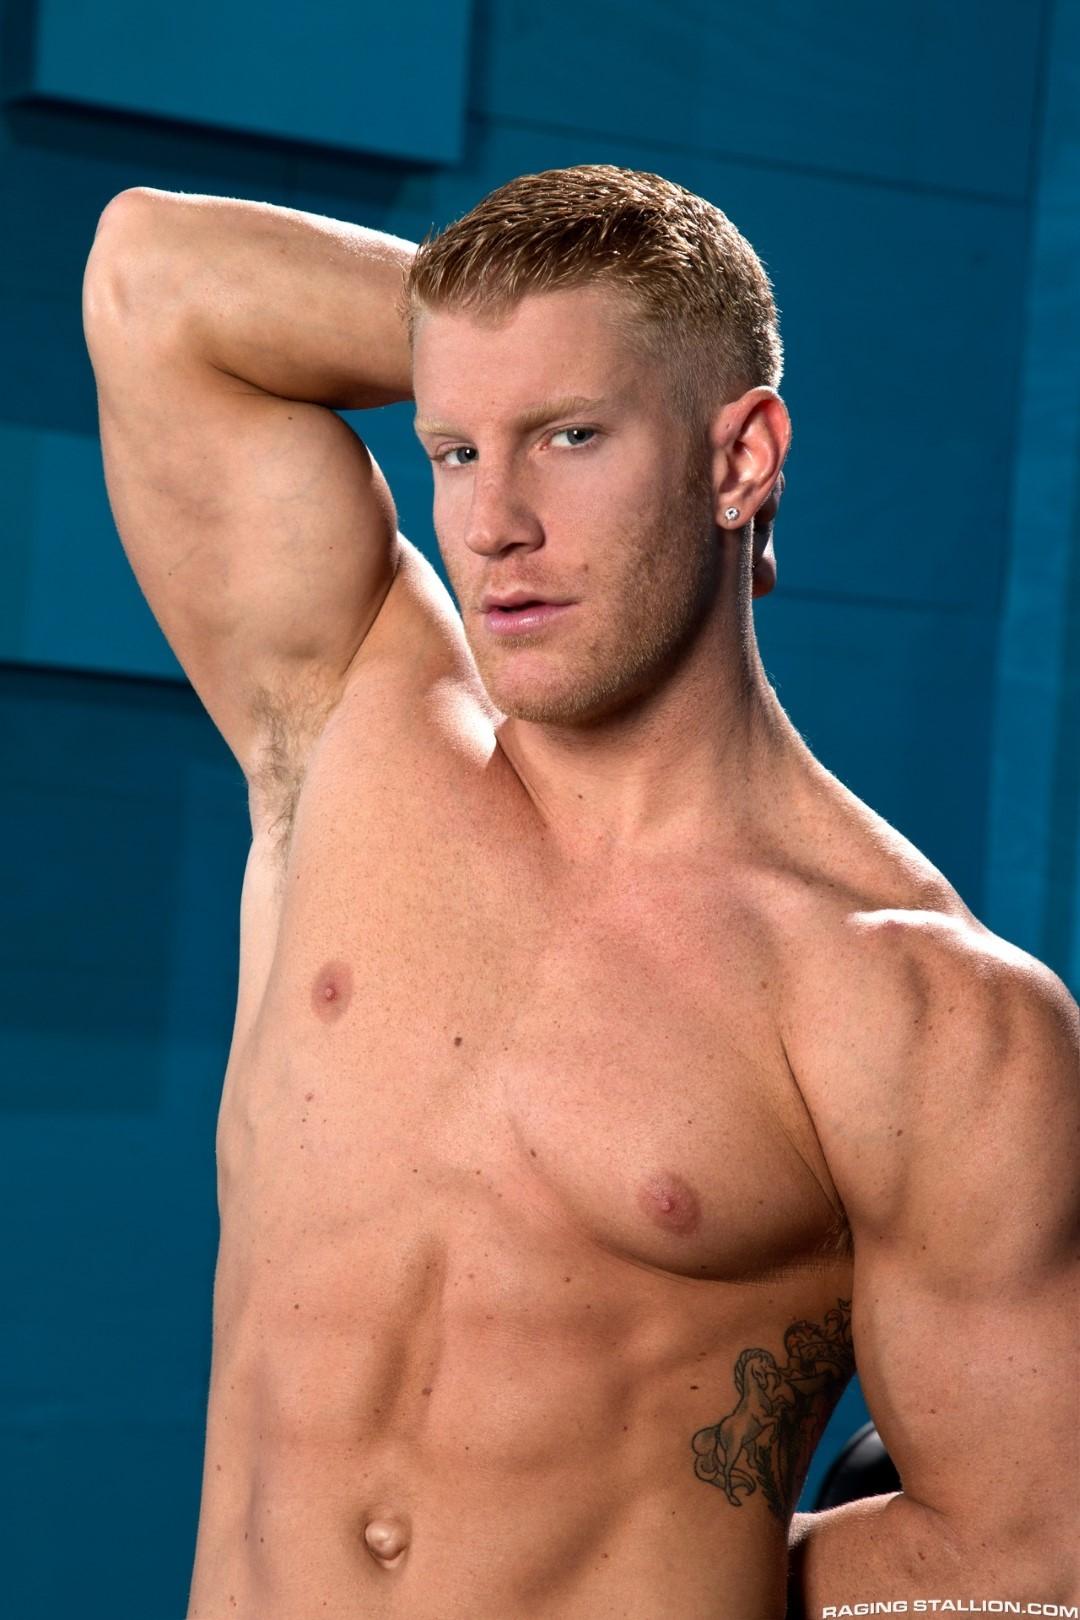 Raging-Stallion-Johnny-V-and-Jaxton-Wheeler-Hairy-Muscle-Hunk-Fucking-Amateur-Gay-Porn-01.jpg